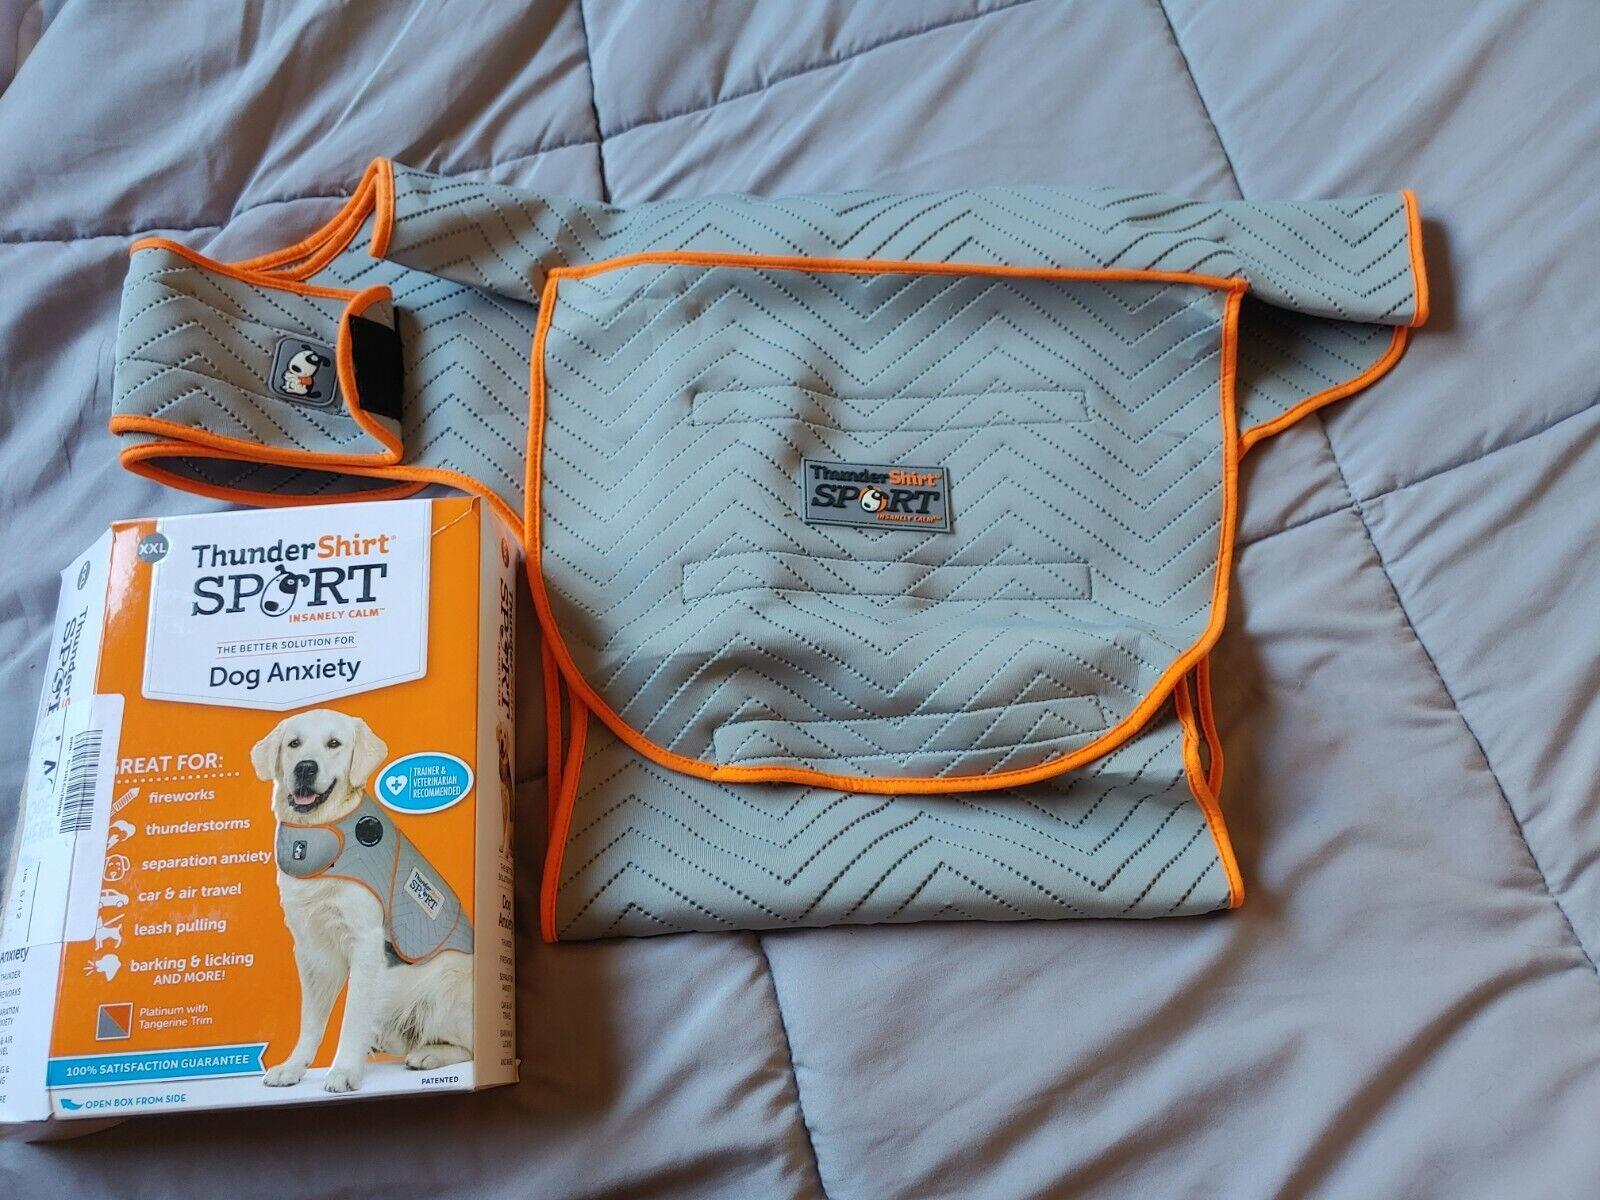 ThunderShirt Sport Dog Anxiety Vest Fireworks Thunder New Open Box XXL - $39.99